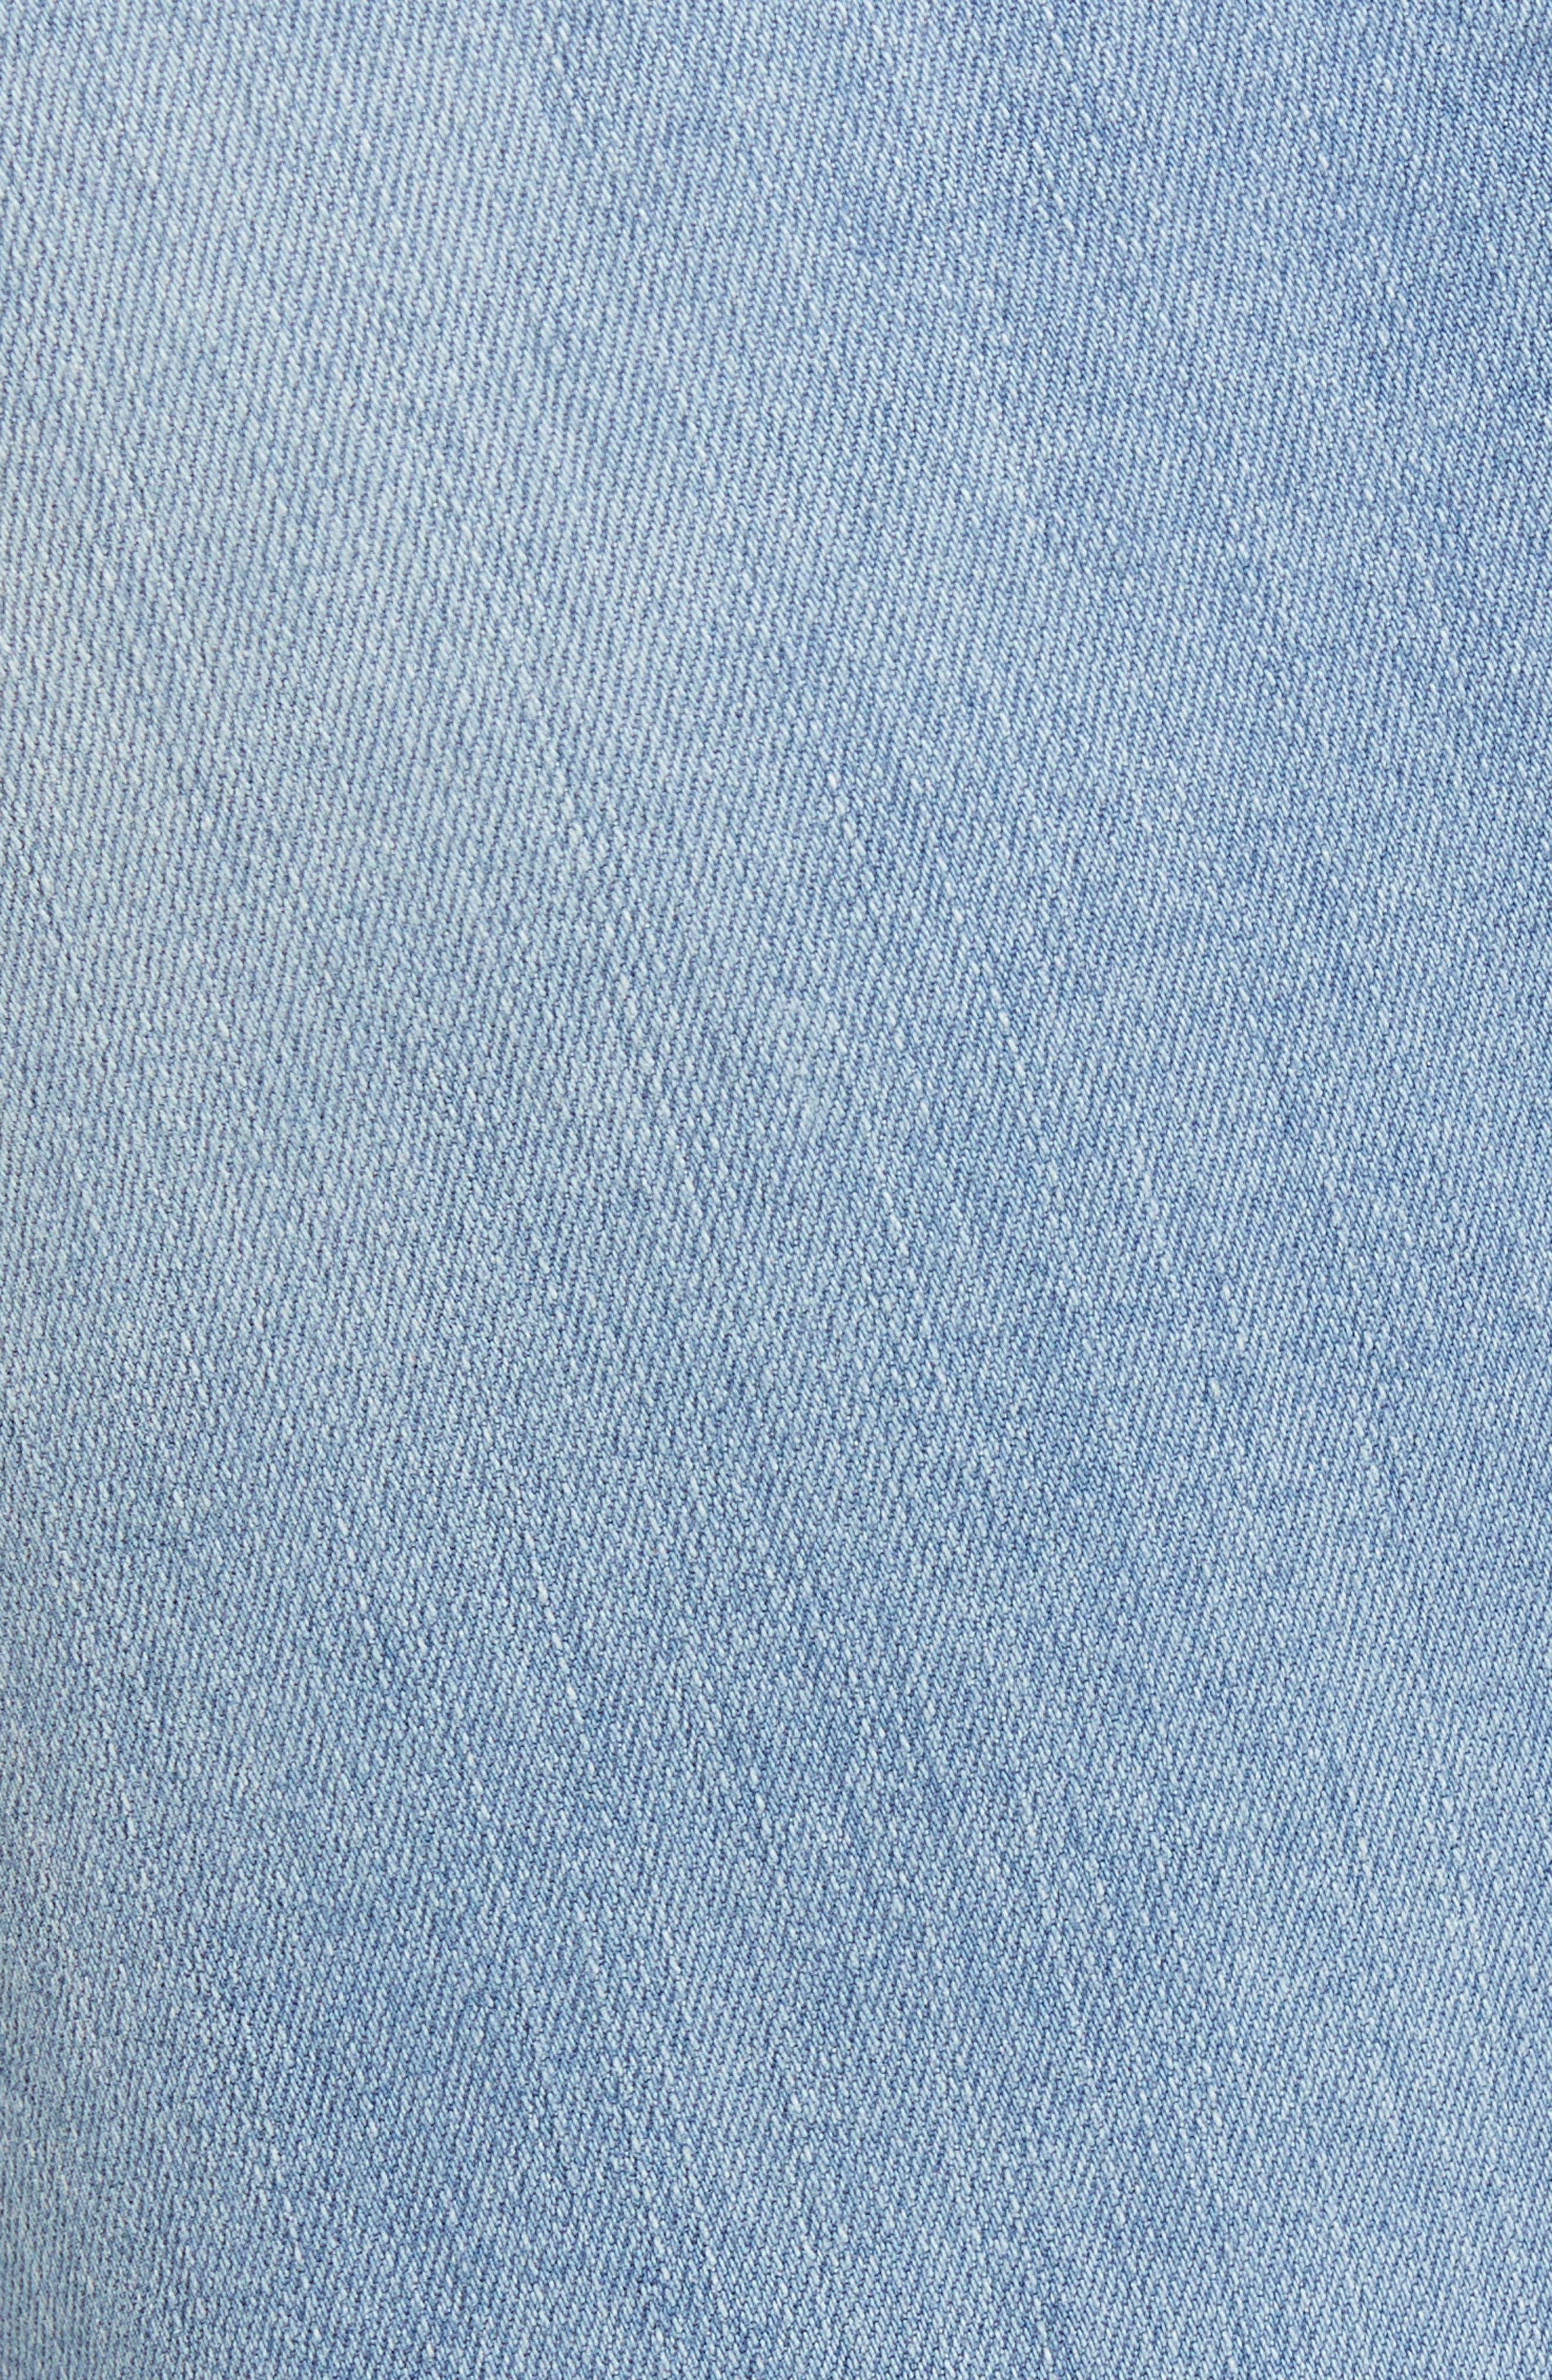 Lea Boyfriend Ripped Jeans,                             Alternate thumbnail 6, color,                             Light Ripped Vintage